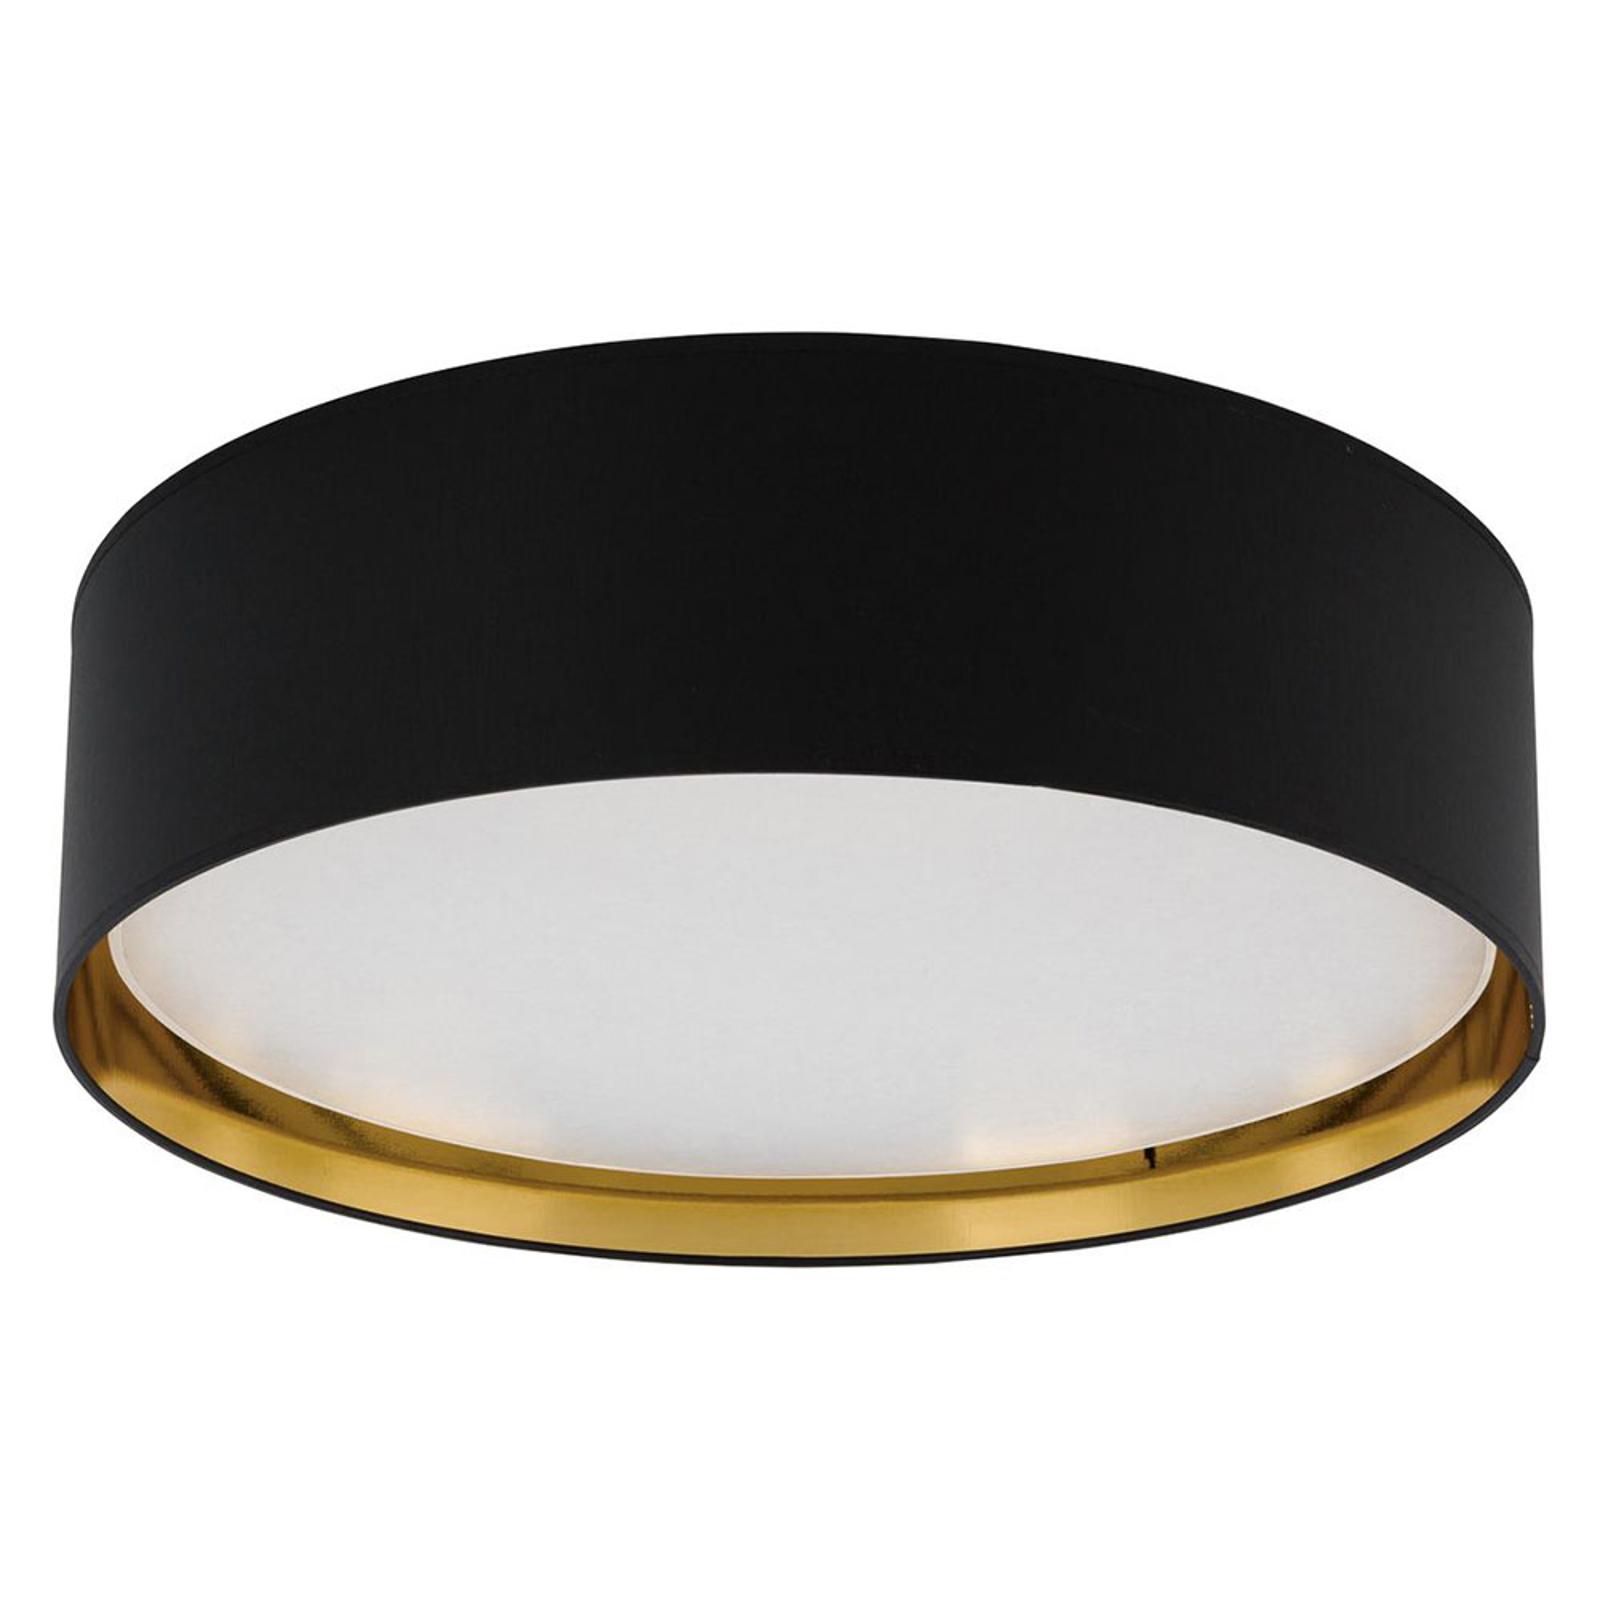 Plafondlamp Bilbao, Ø 60 cm, zwart/wit